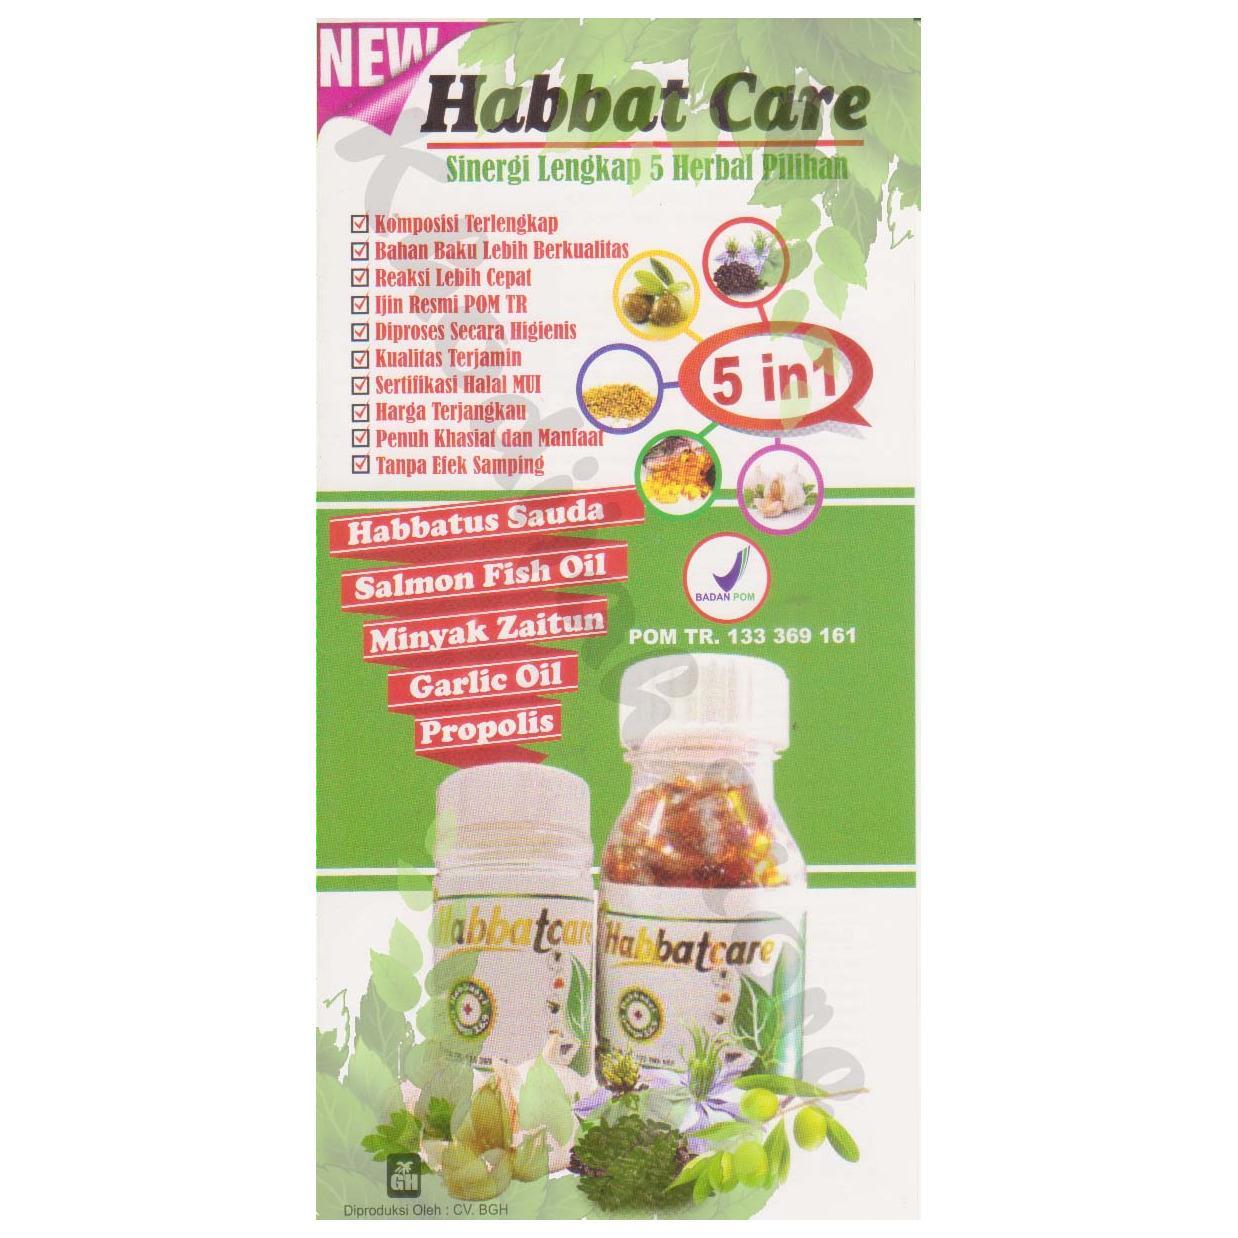 Harga Habbatcare 5 In 1 Habasyi Omega 3 6 9 200 Kaps Habbatus Sauda